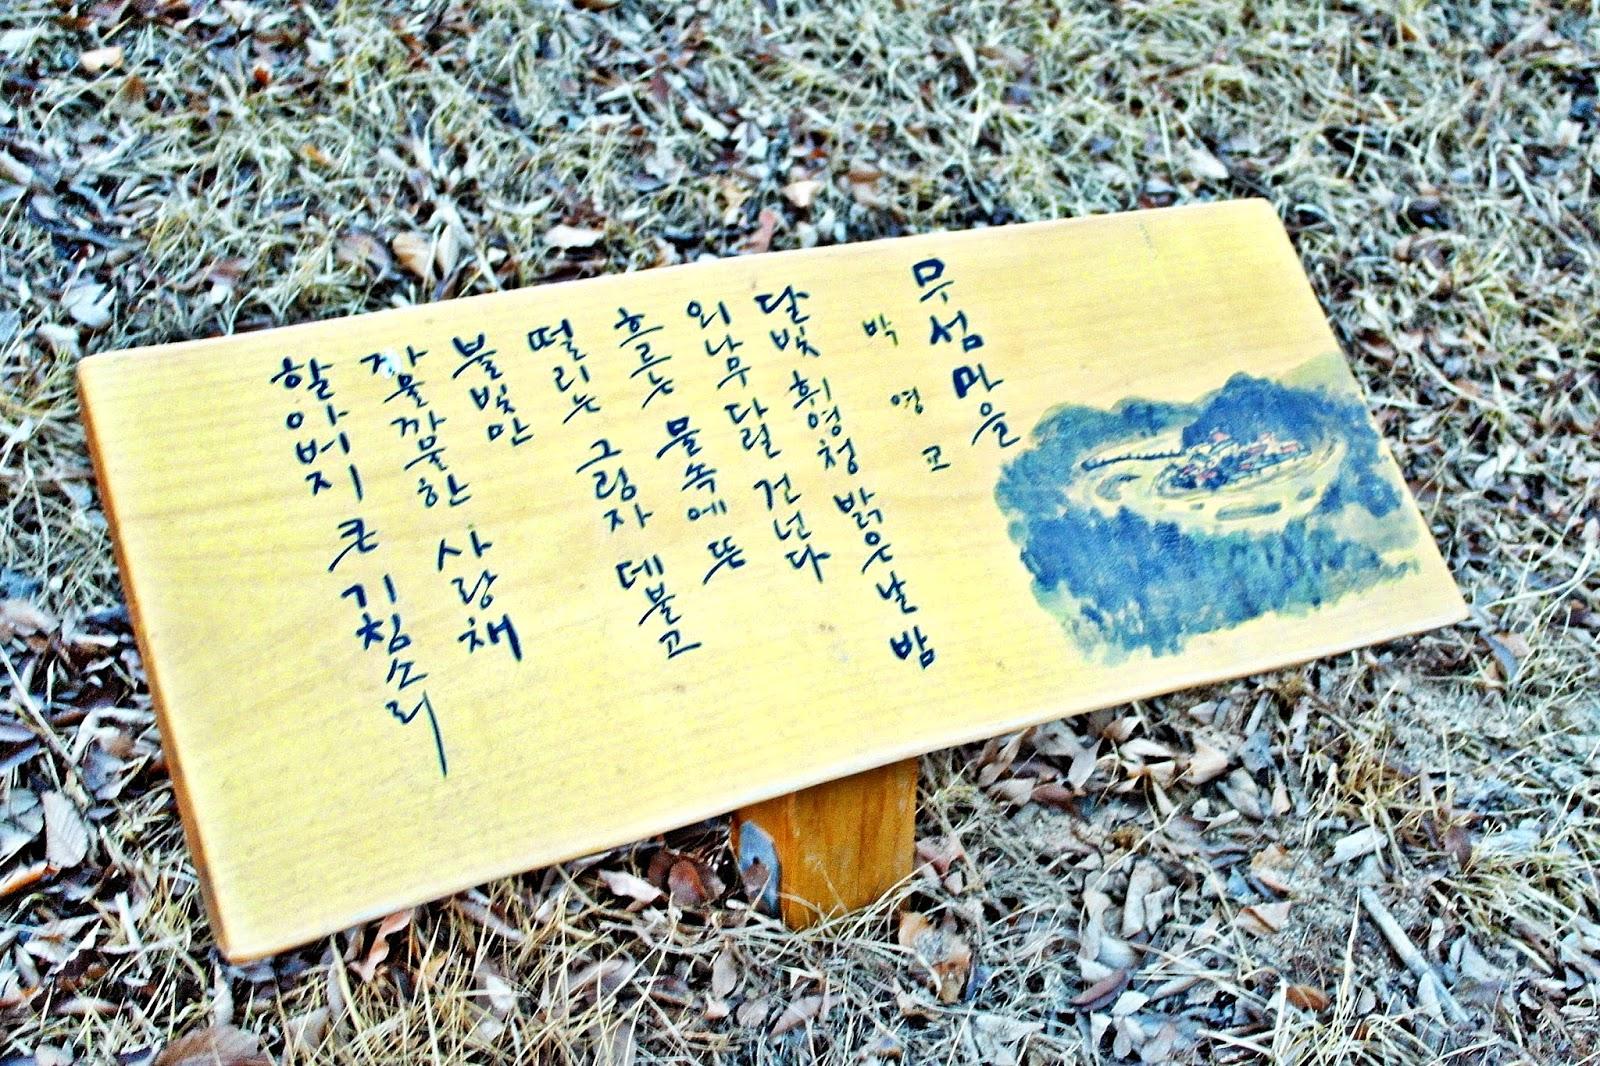 Yeongju Museom Hanok Village 무섬마을 | meheartsoul.blogspot.com